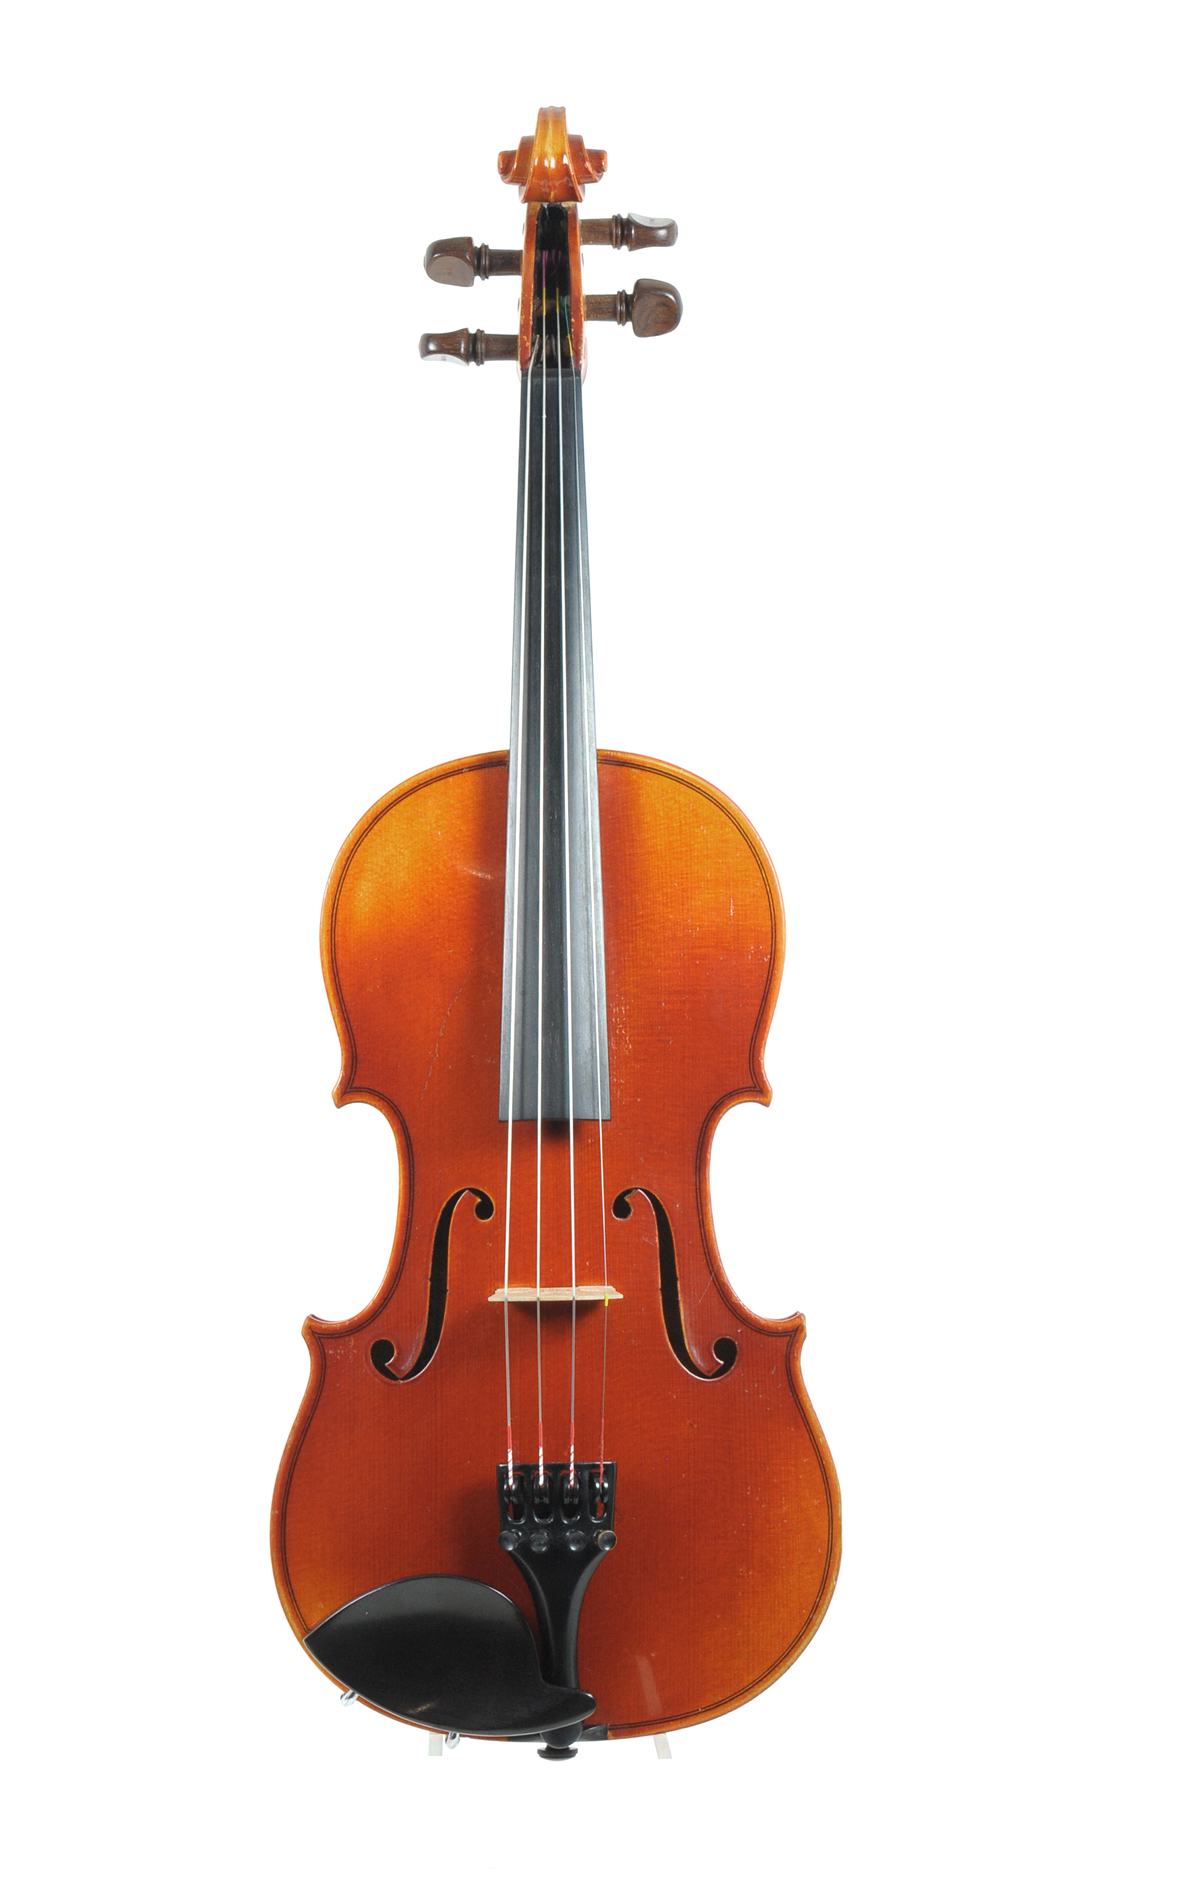 3 4 ernst heinrich roth 3 4 violin children 39 s violins bubenreuth ernst heinrich roth. Black Bedroom Furniture Sets. Home Design Ideas